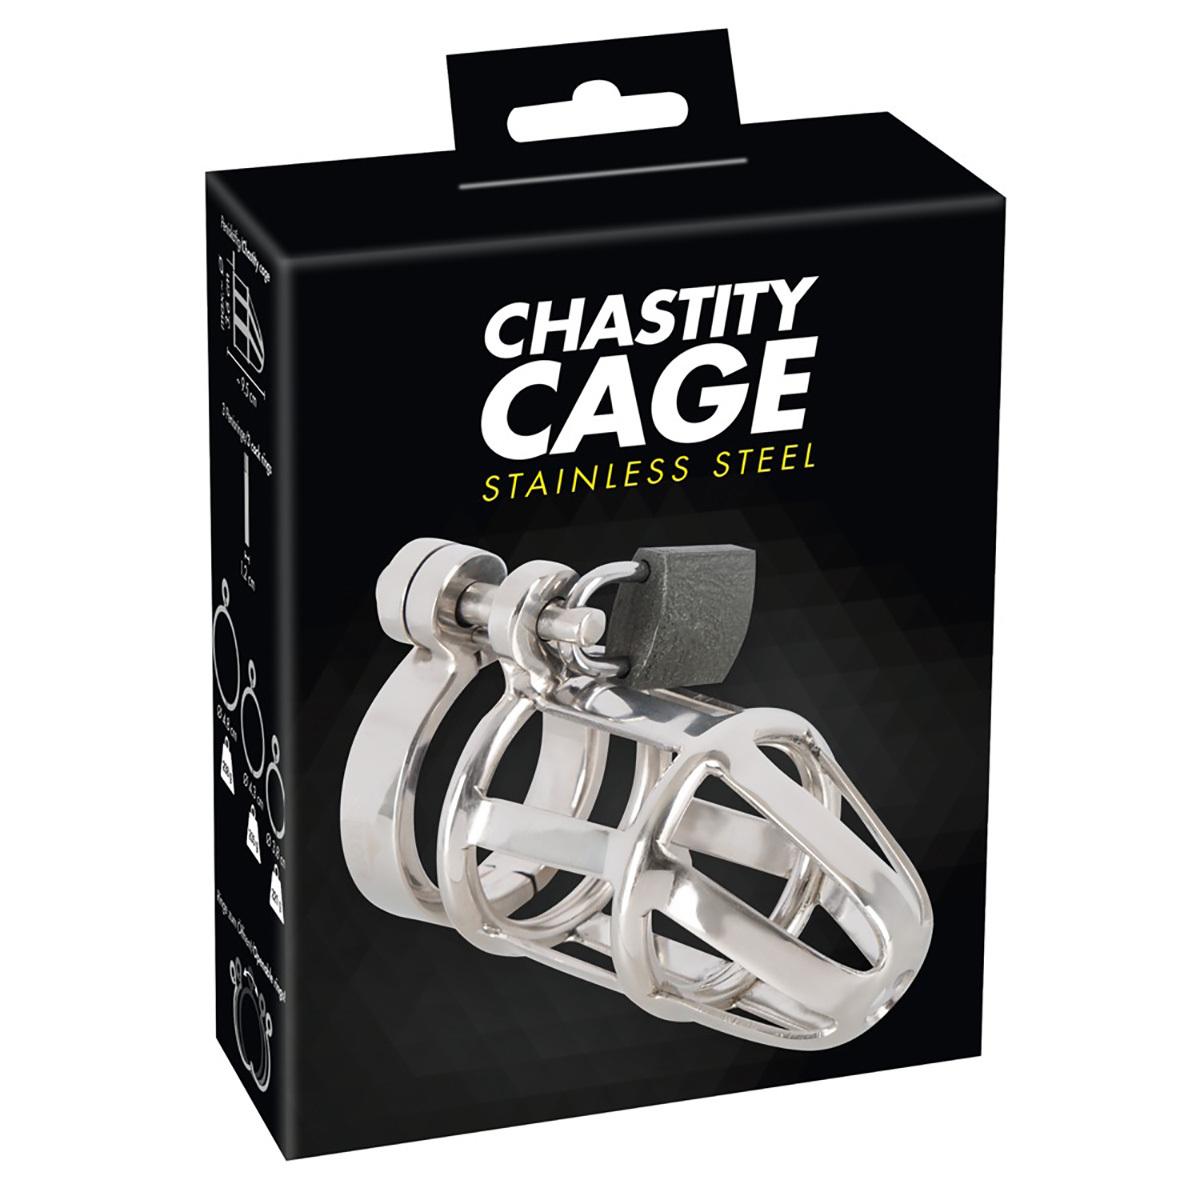 Мужской пояс верности Chastity Cage фото